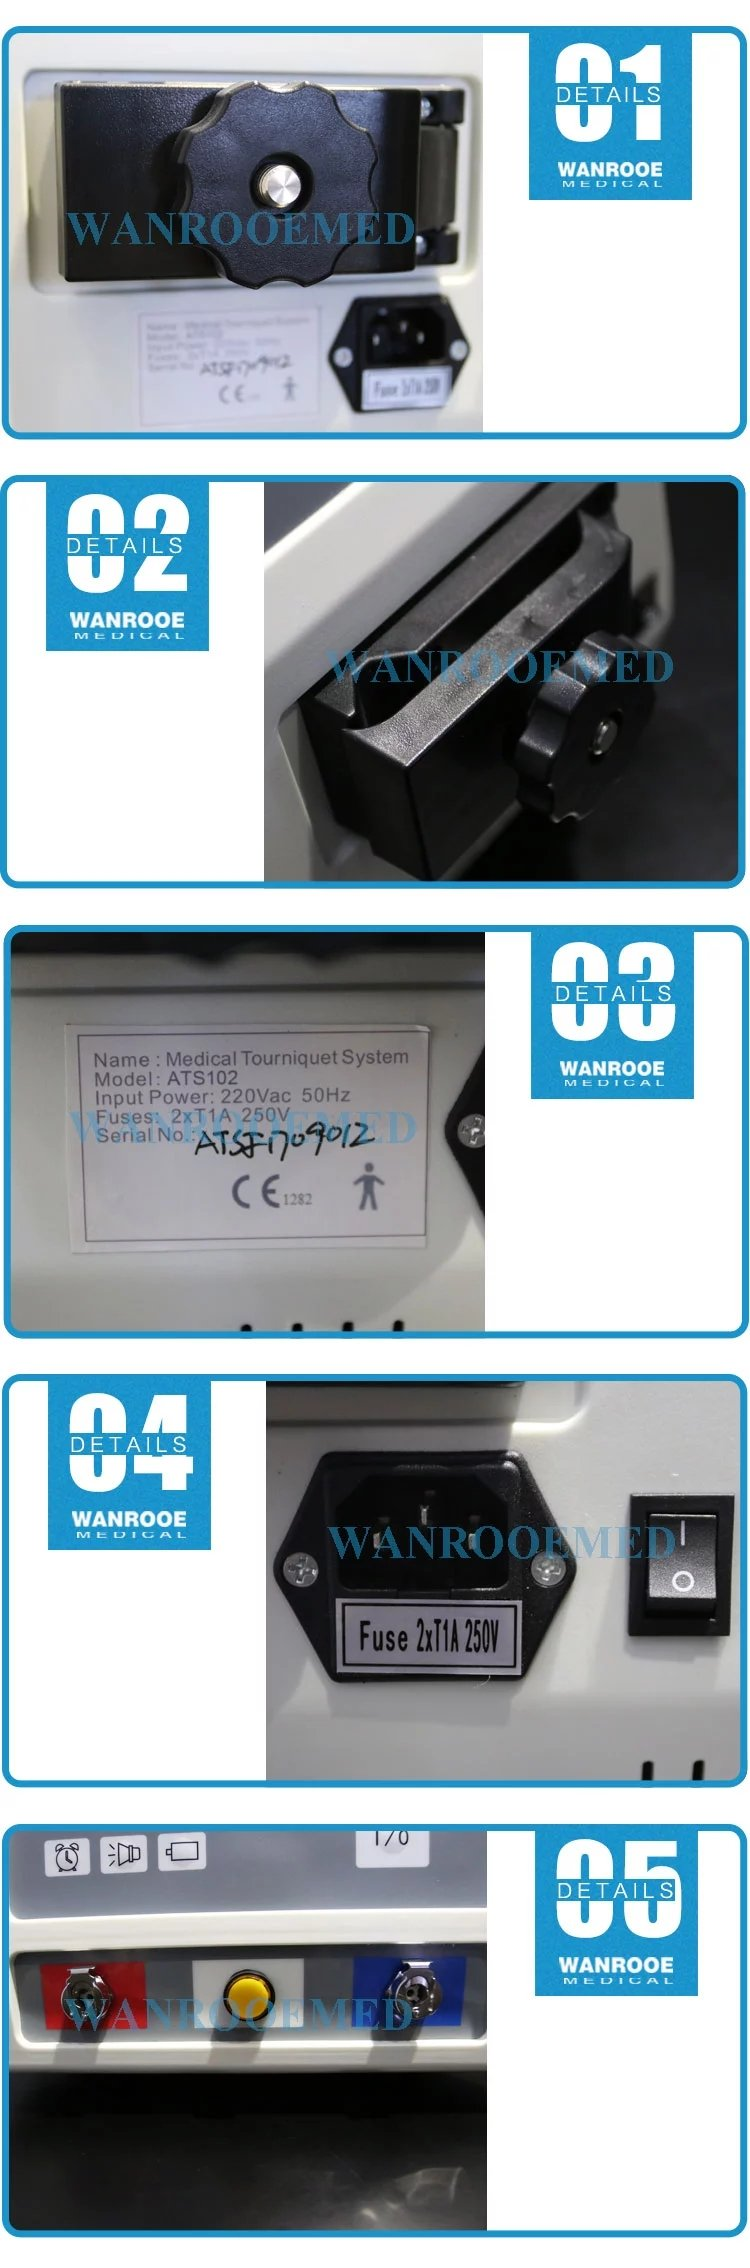 Hospital Tourniquet Machine, Pneumatic Electric Tourniquet, Medical Tourniquet Machine, Automatic Tourniquet Machine, Electronic Tourniquet Machine